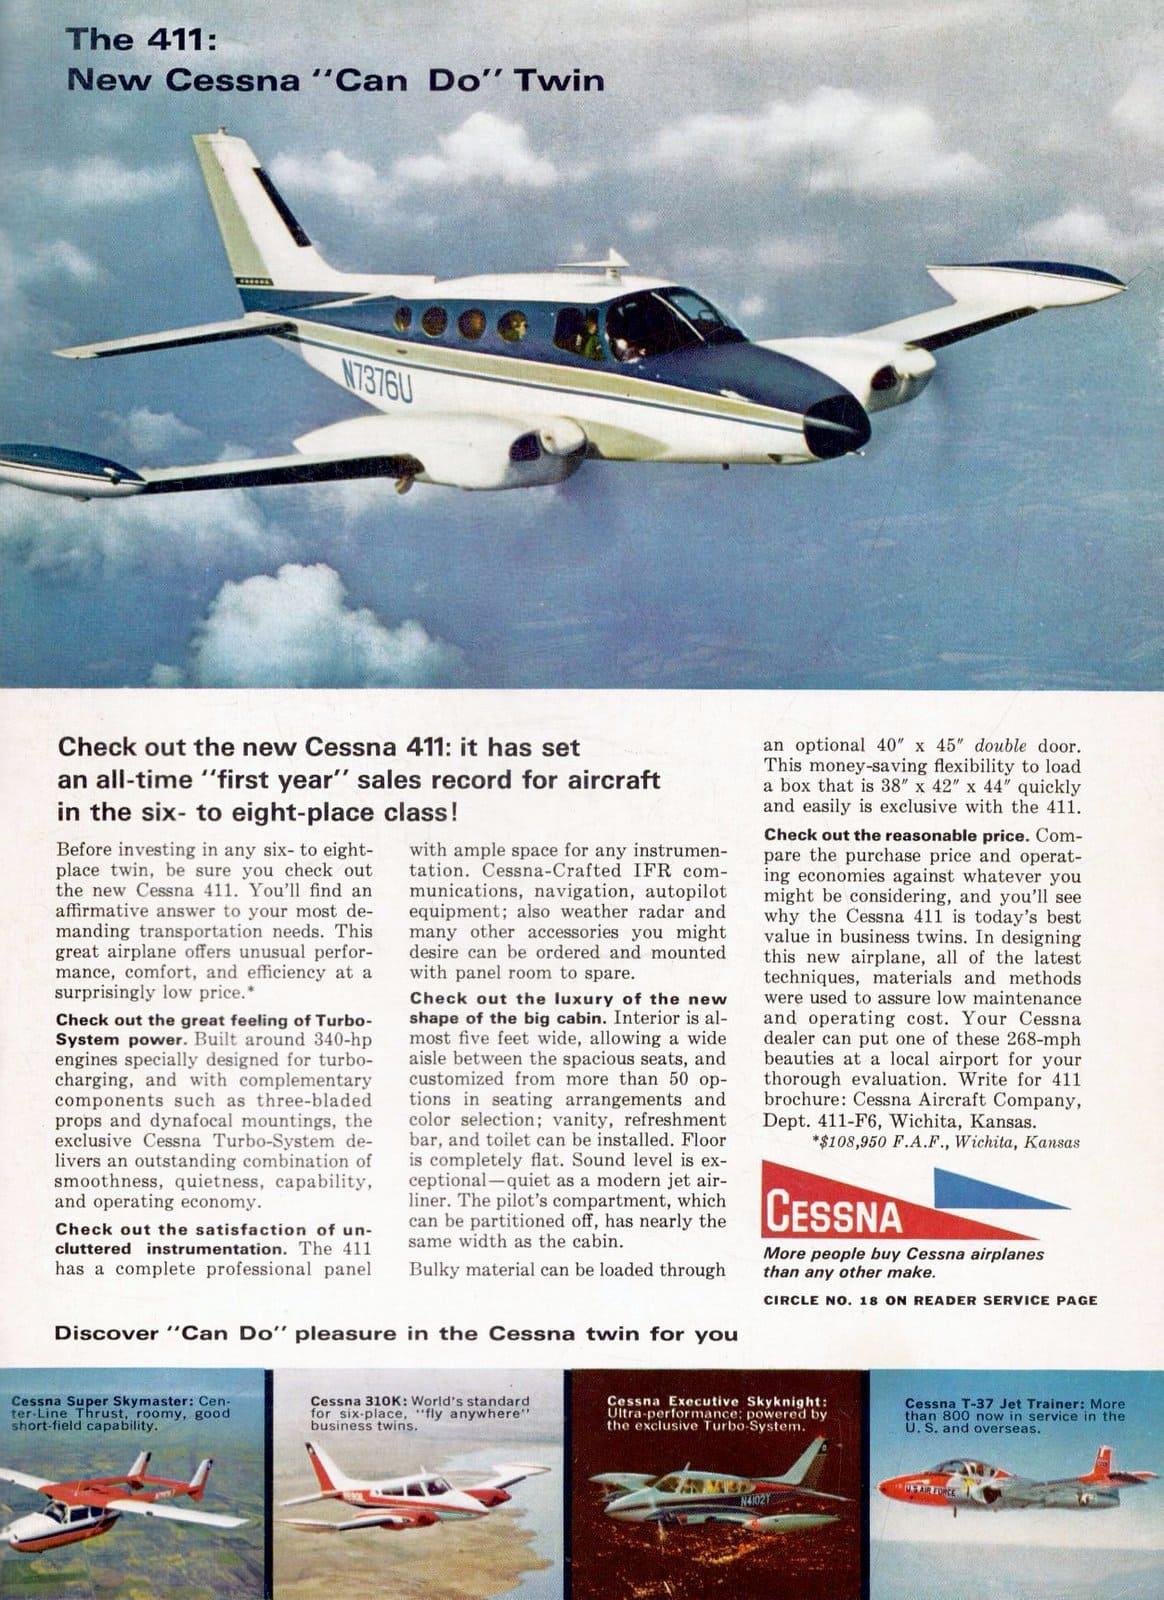 1960s Cessna Twin prop plane (1966)